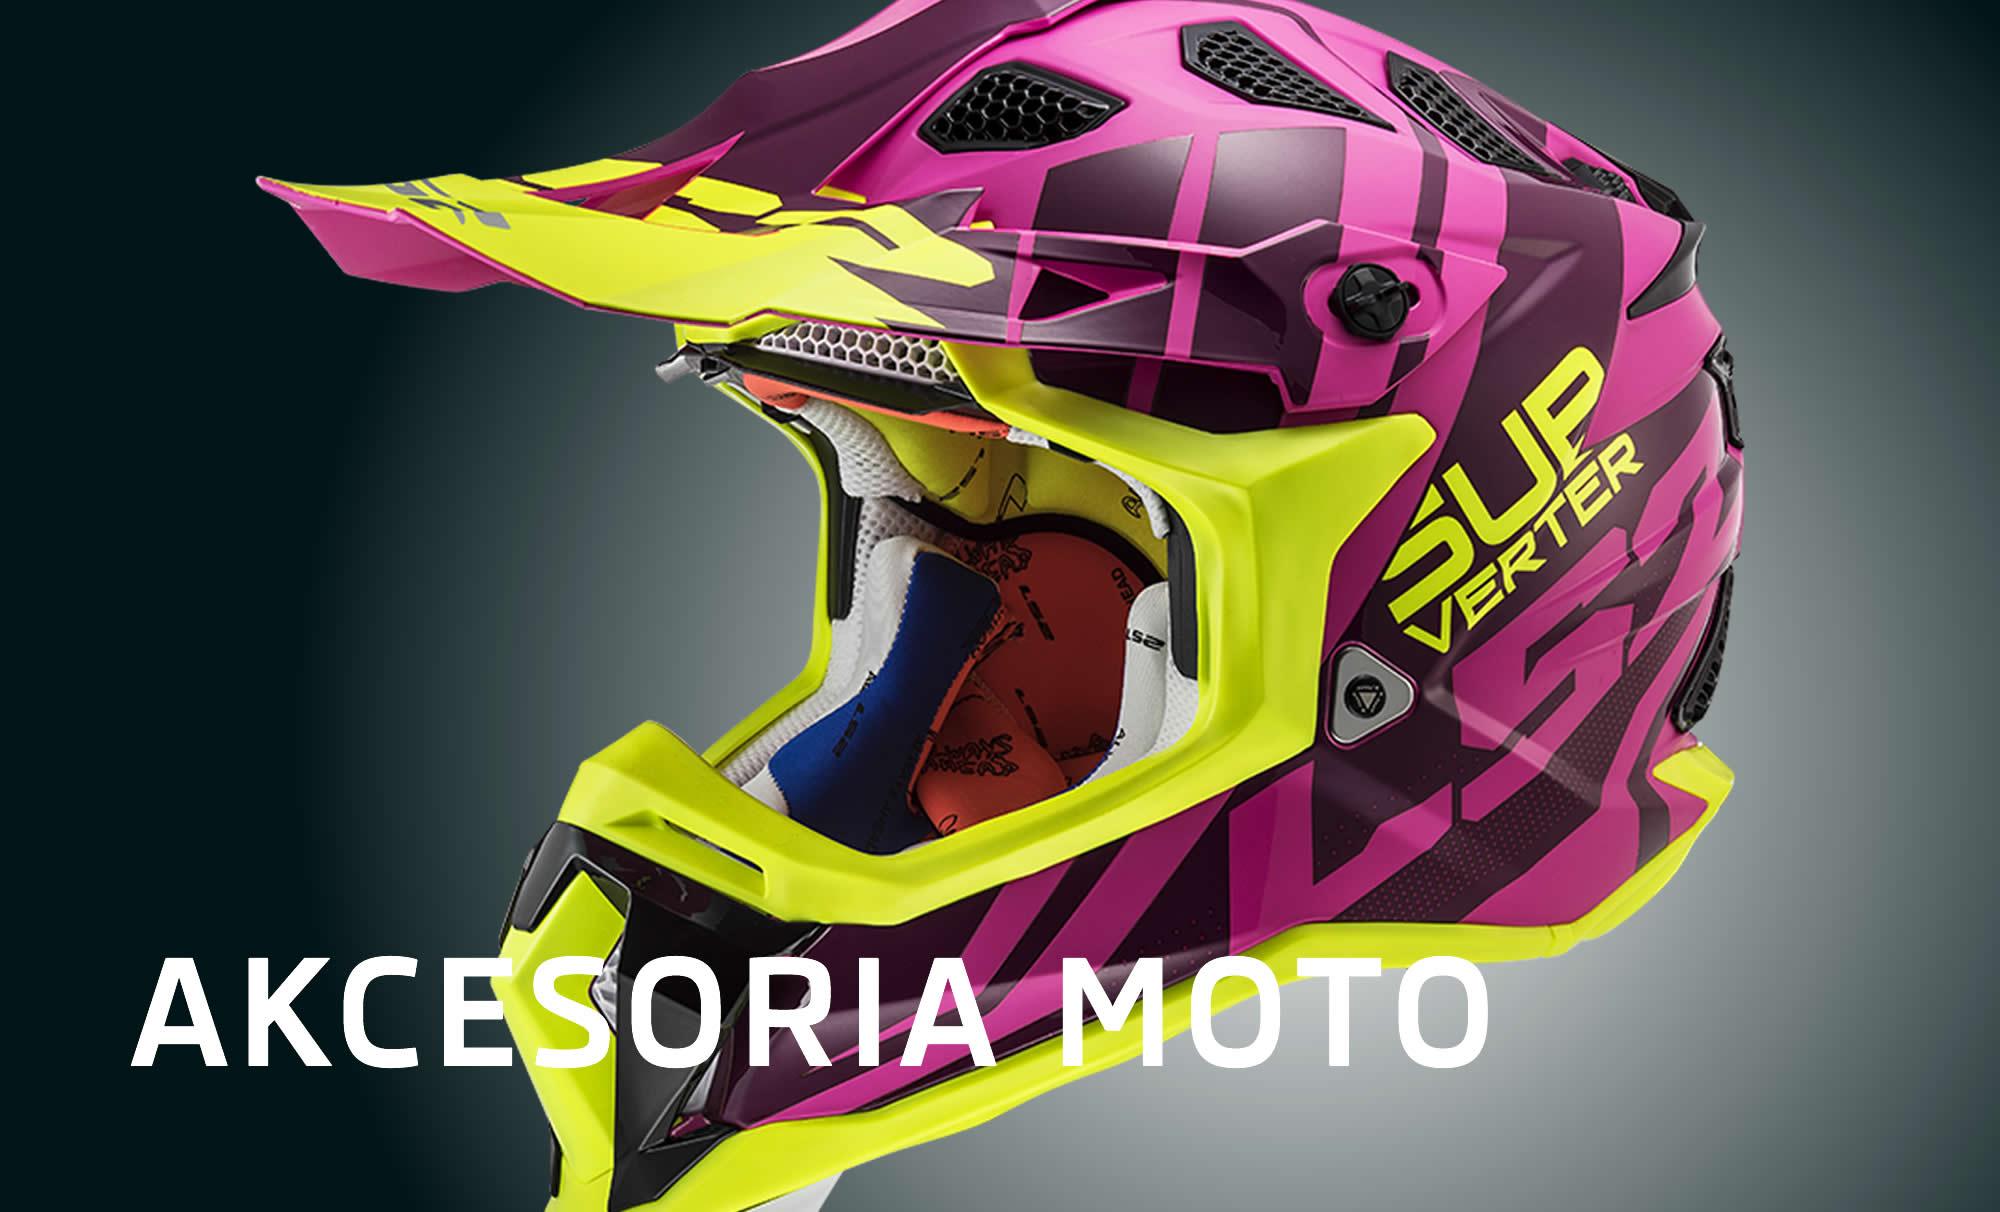 Akcesoria Moto